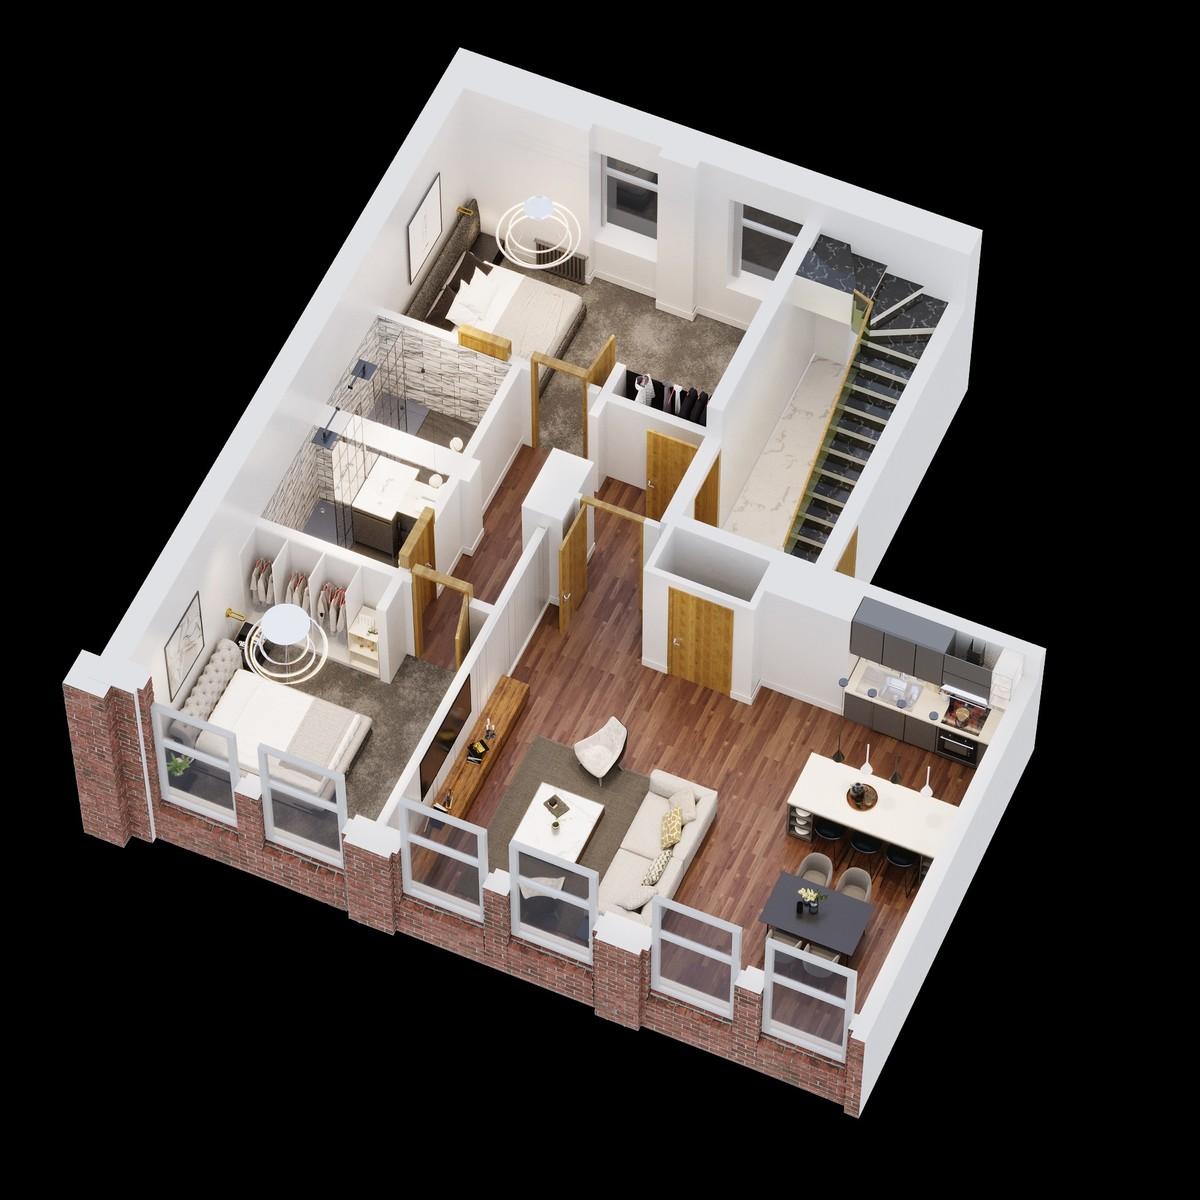 Sydenham Place, Tenby Street North, Jewellery Quarter floorplan 2 of 2